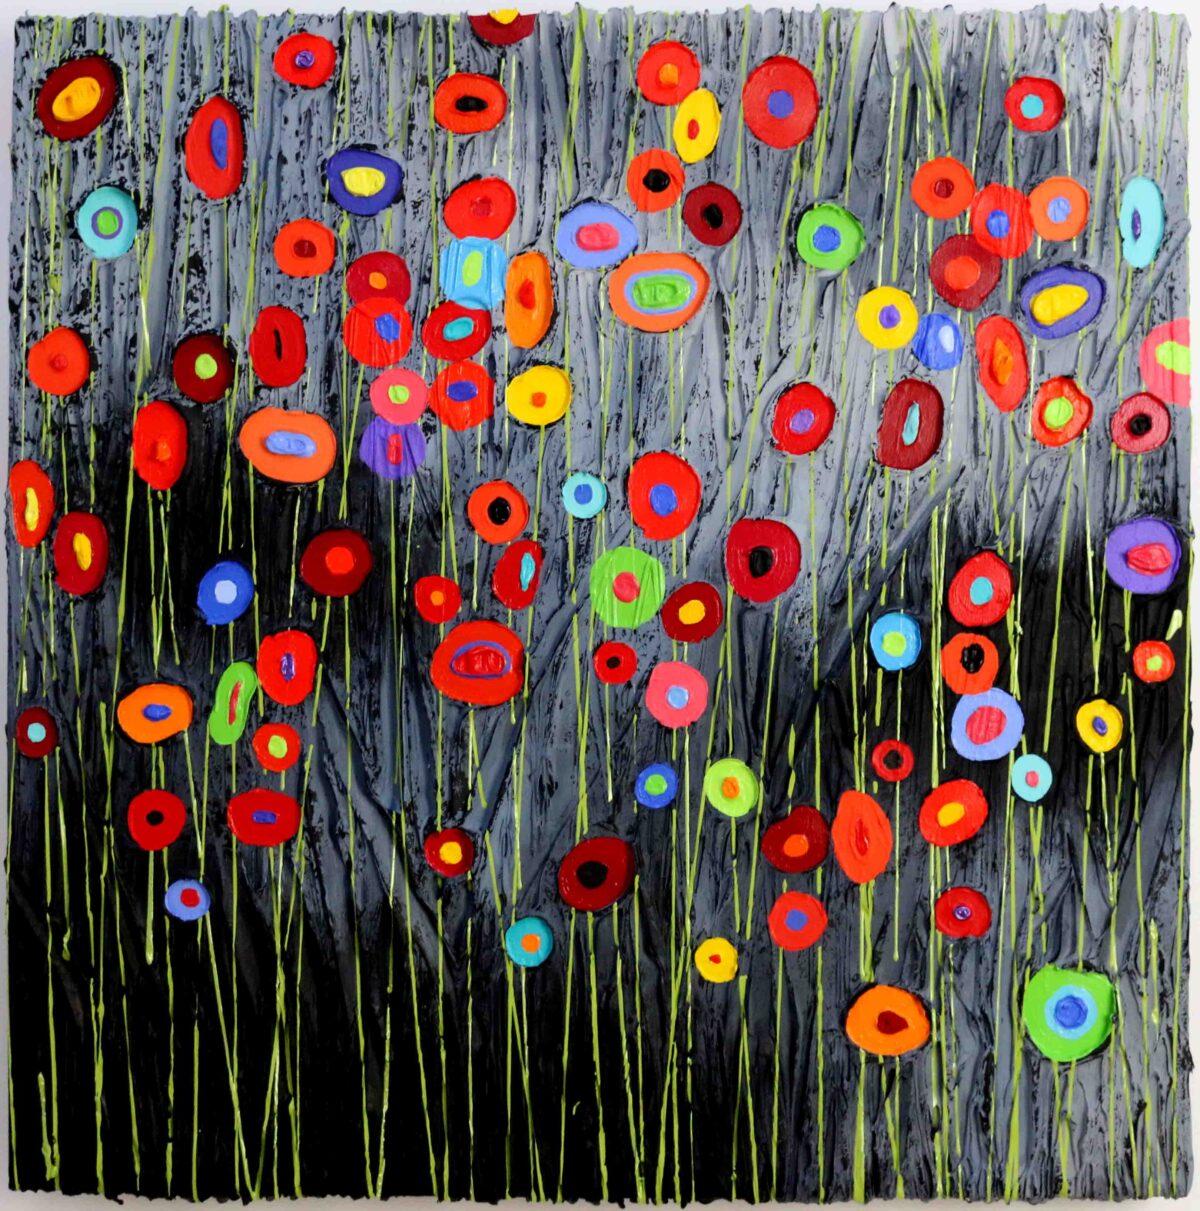 """Barcelona Celebration"" - Jeff Hanson Art Original Painting"